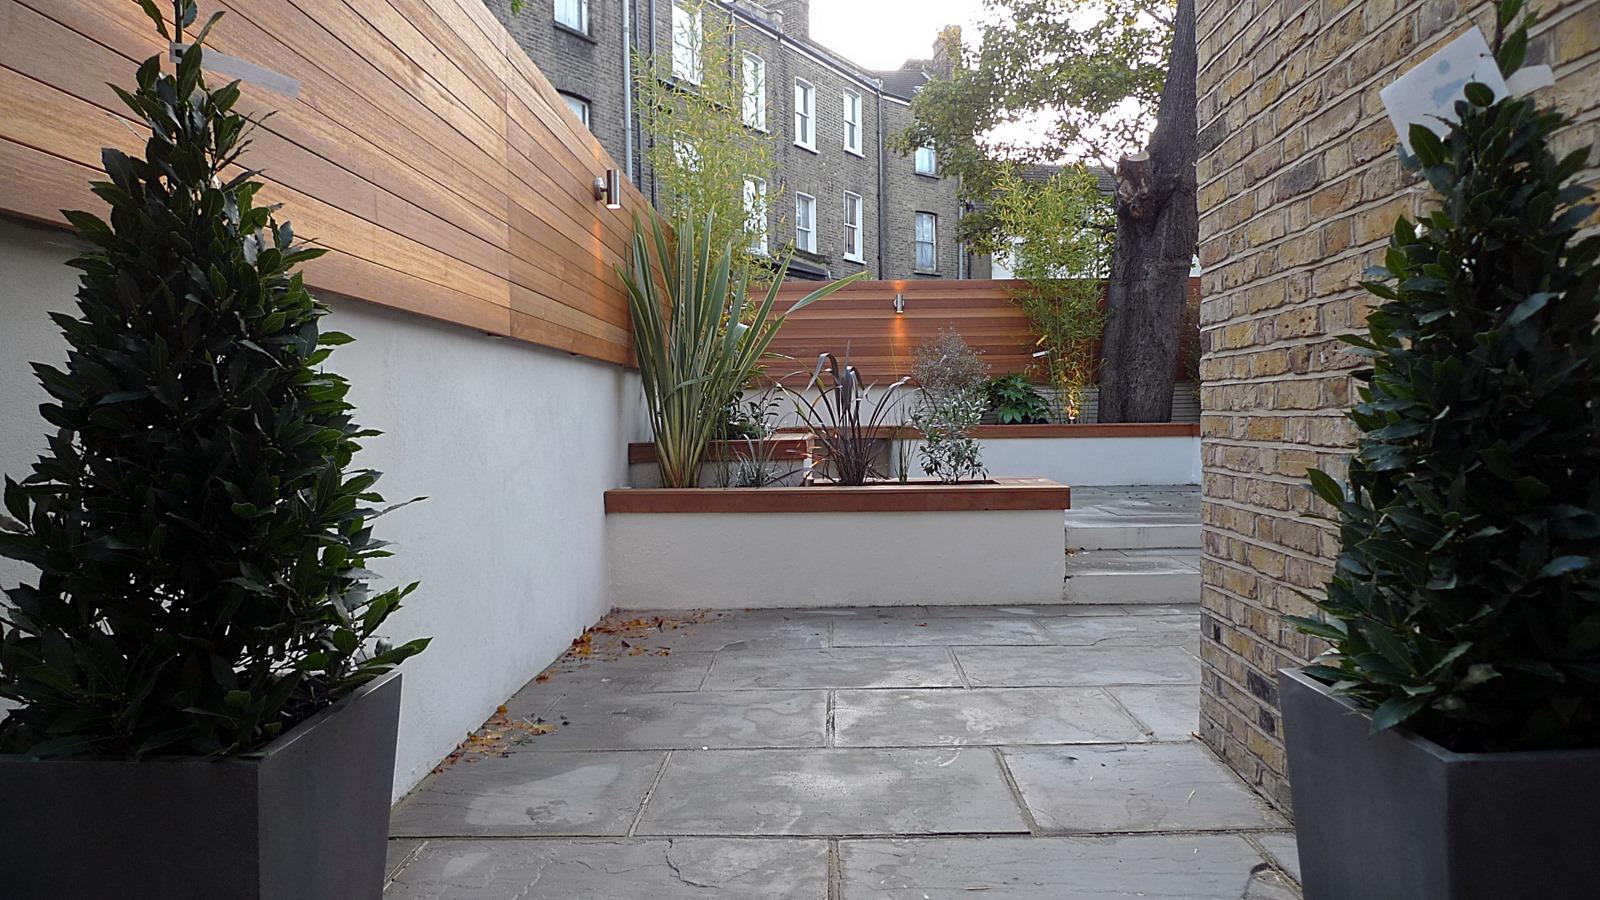 modern london courtyard low maintenance urban outdoor indoor living garden space paving screens planting bench raised beds (8)